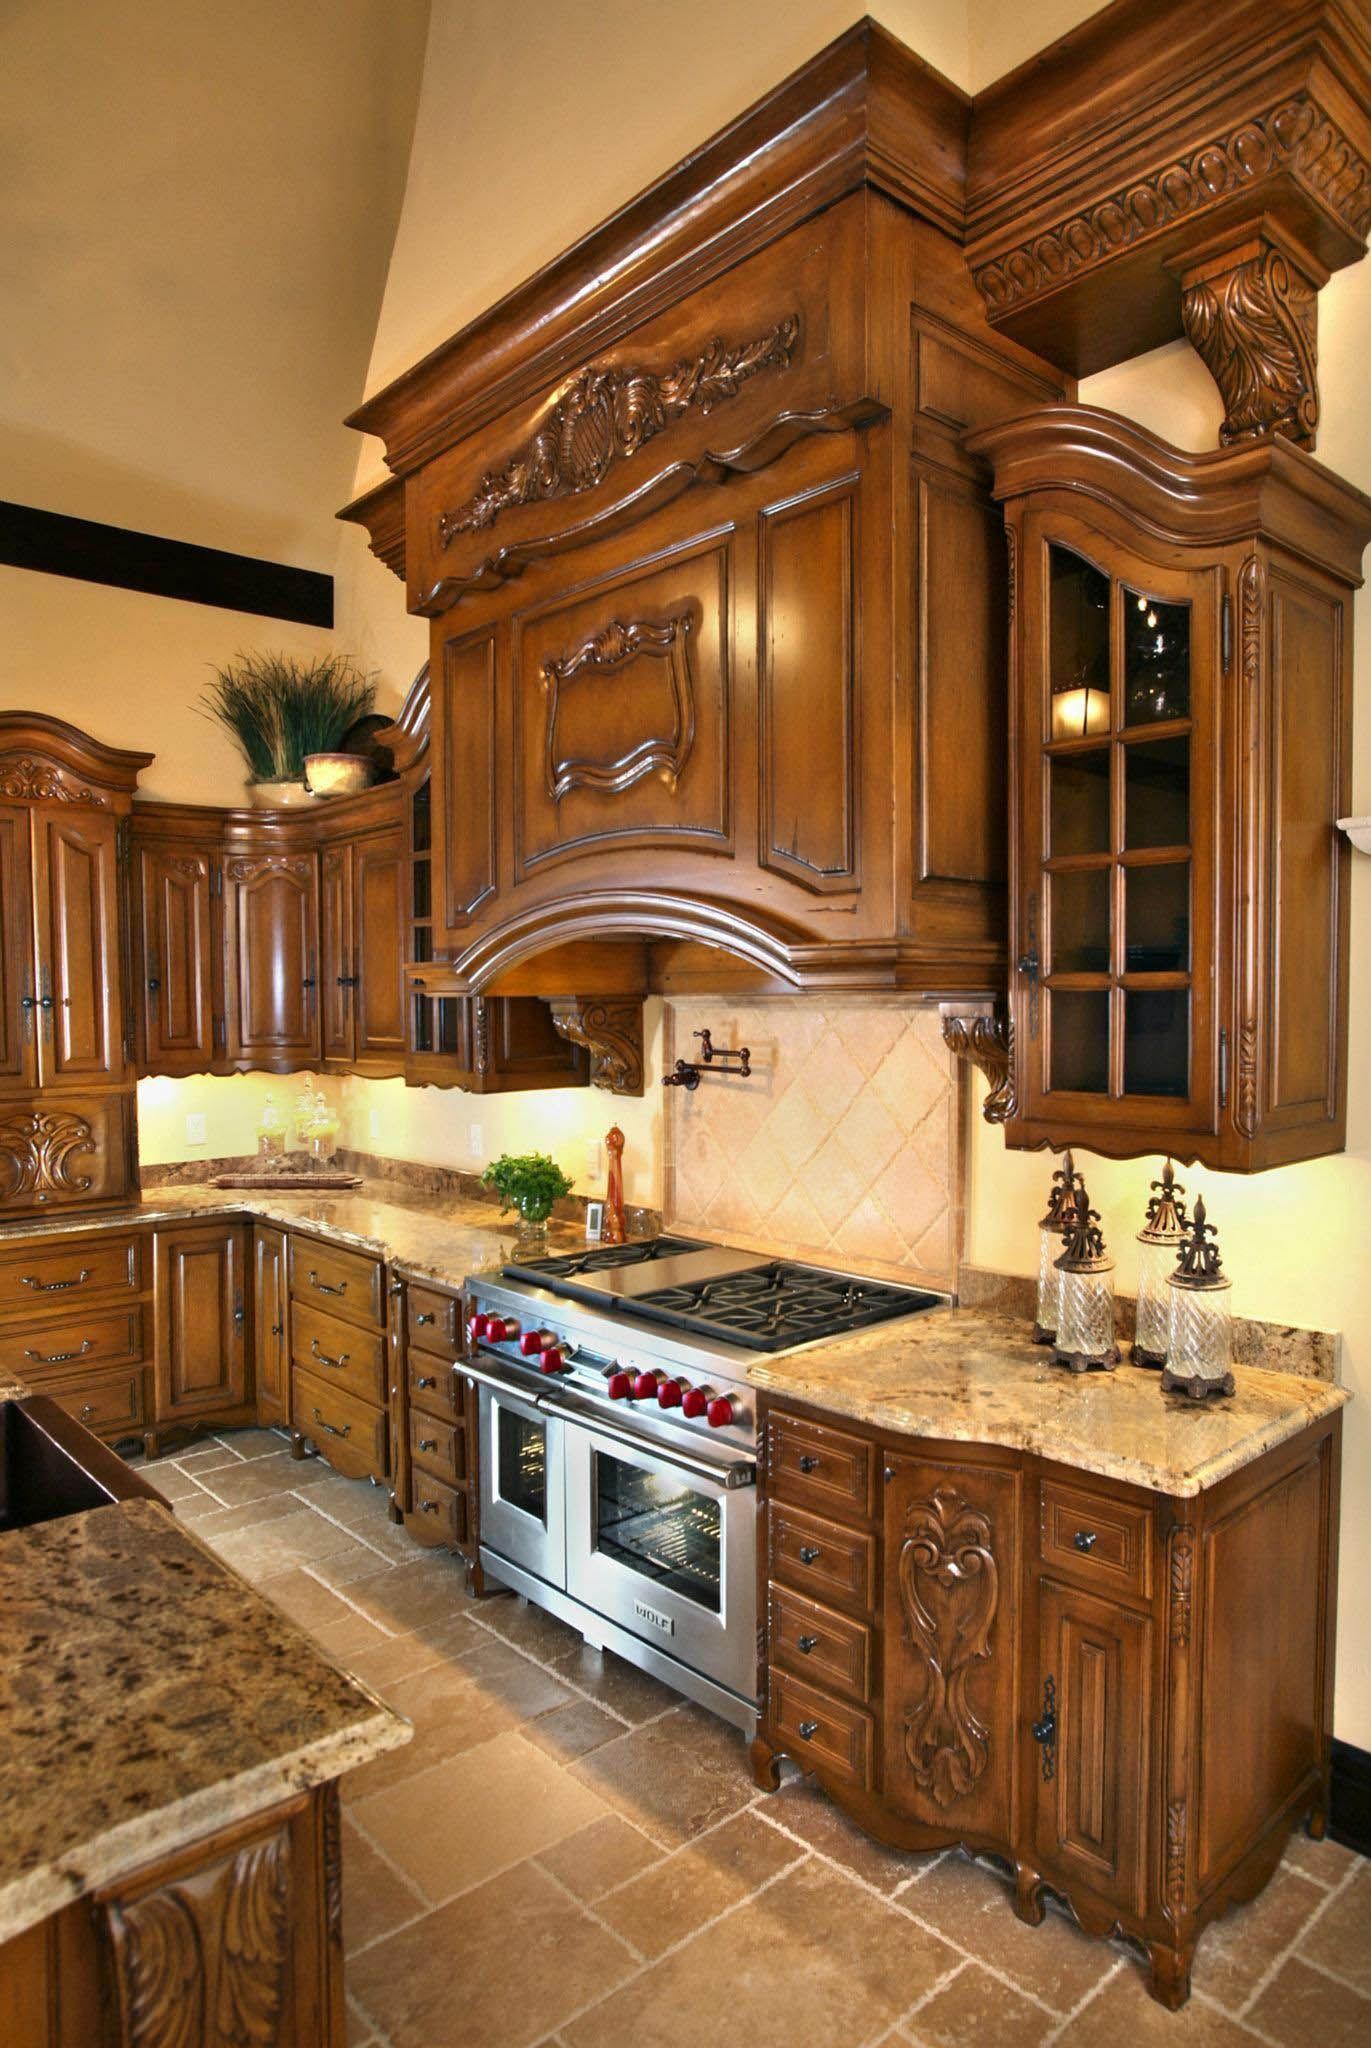 Rustic Kitchen Cabinets Tuscan Kitchen Tuscan Kitchen Design Home Decor Kitchen